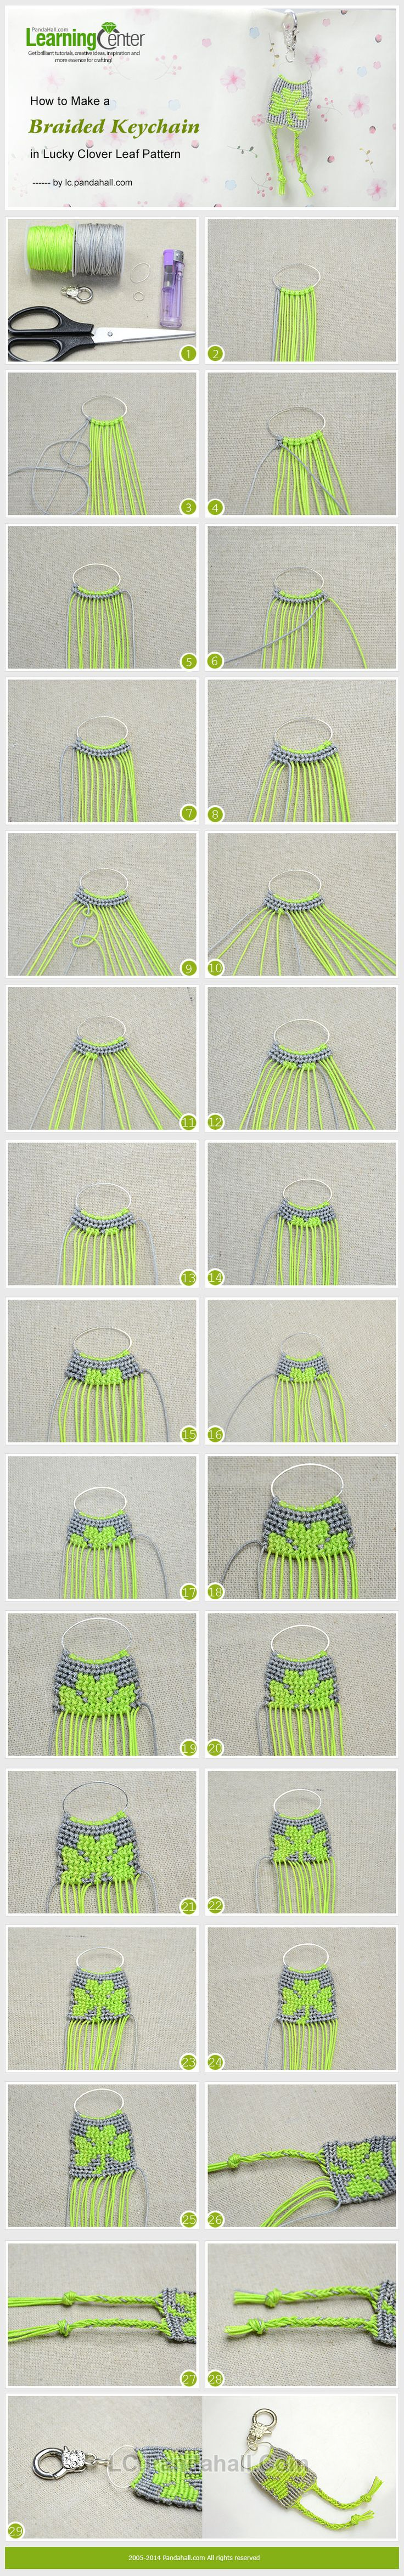 How to Make a Braided Keychain in Lucky Clover Leaf Pattern ou idée de fermoir pour ouvrage en perles tissées